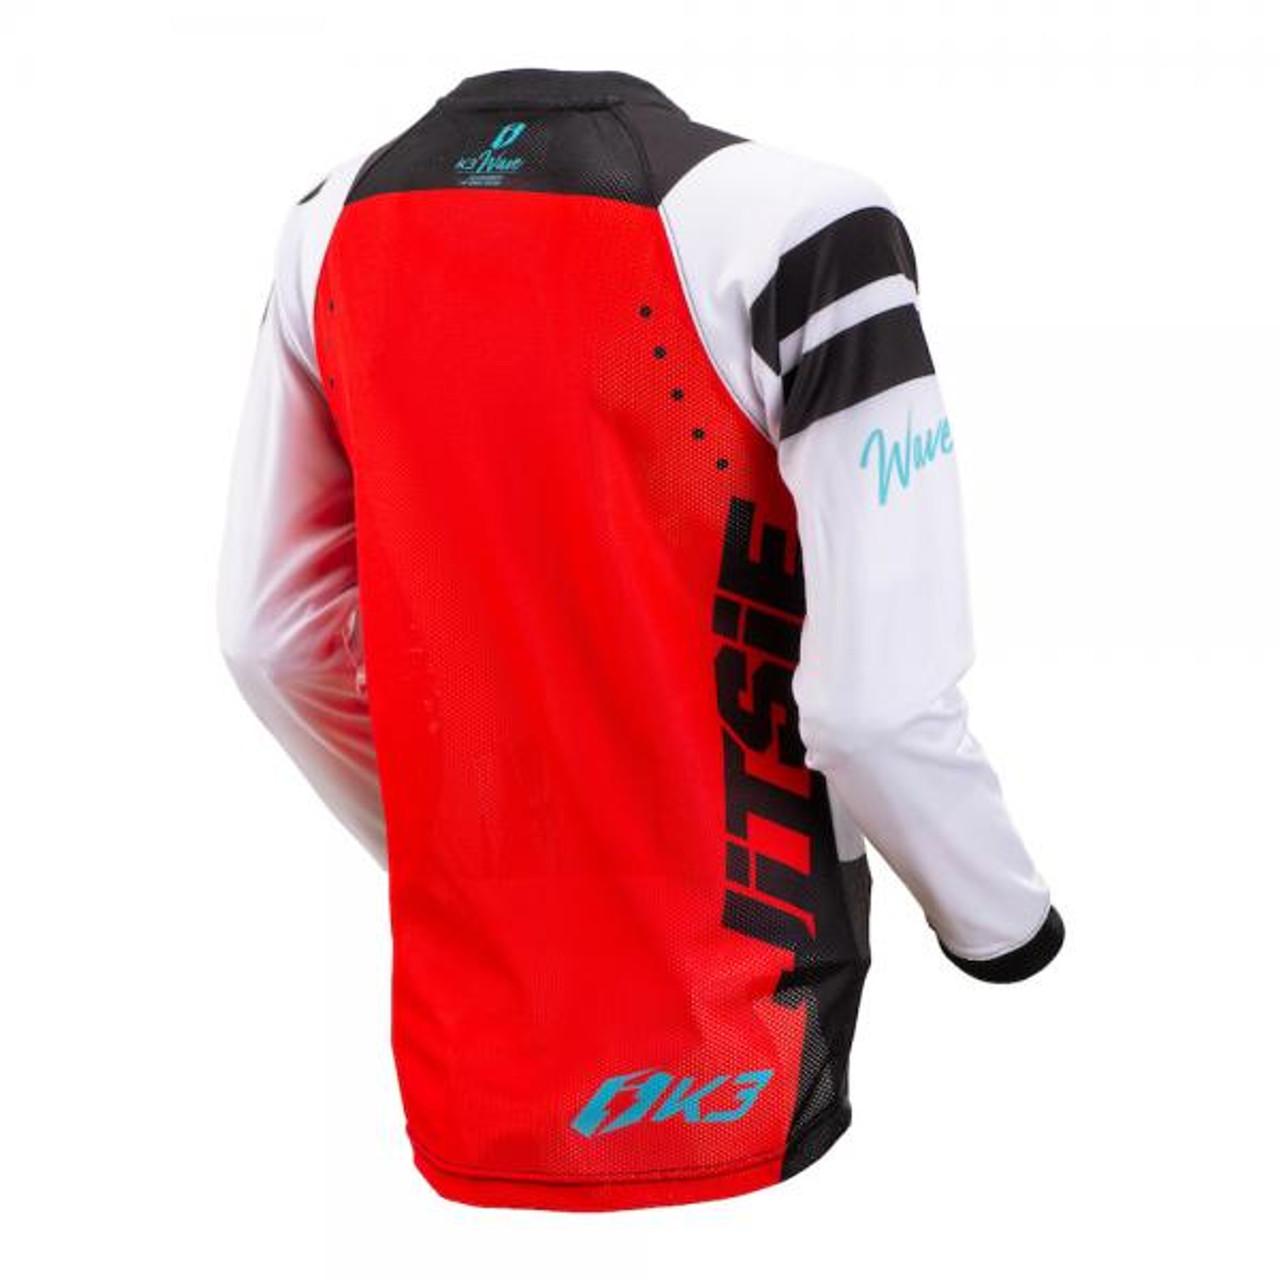 Kid's trials Jersey K3 Wave, black/ red/ teal